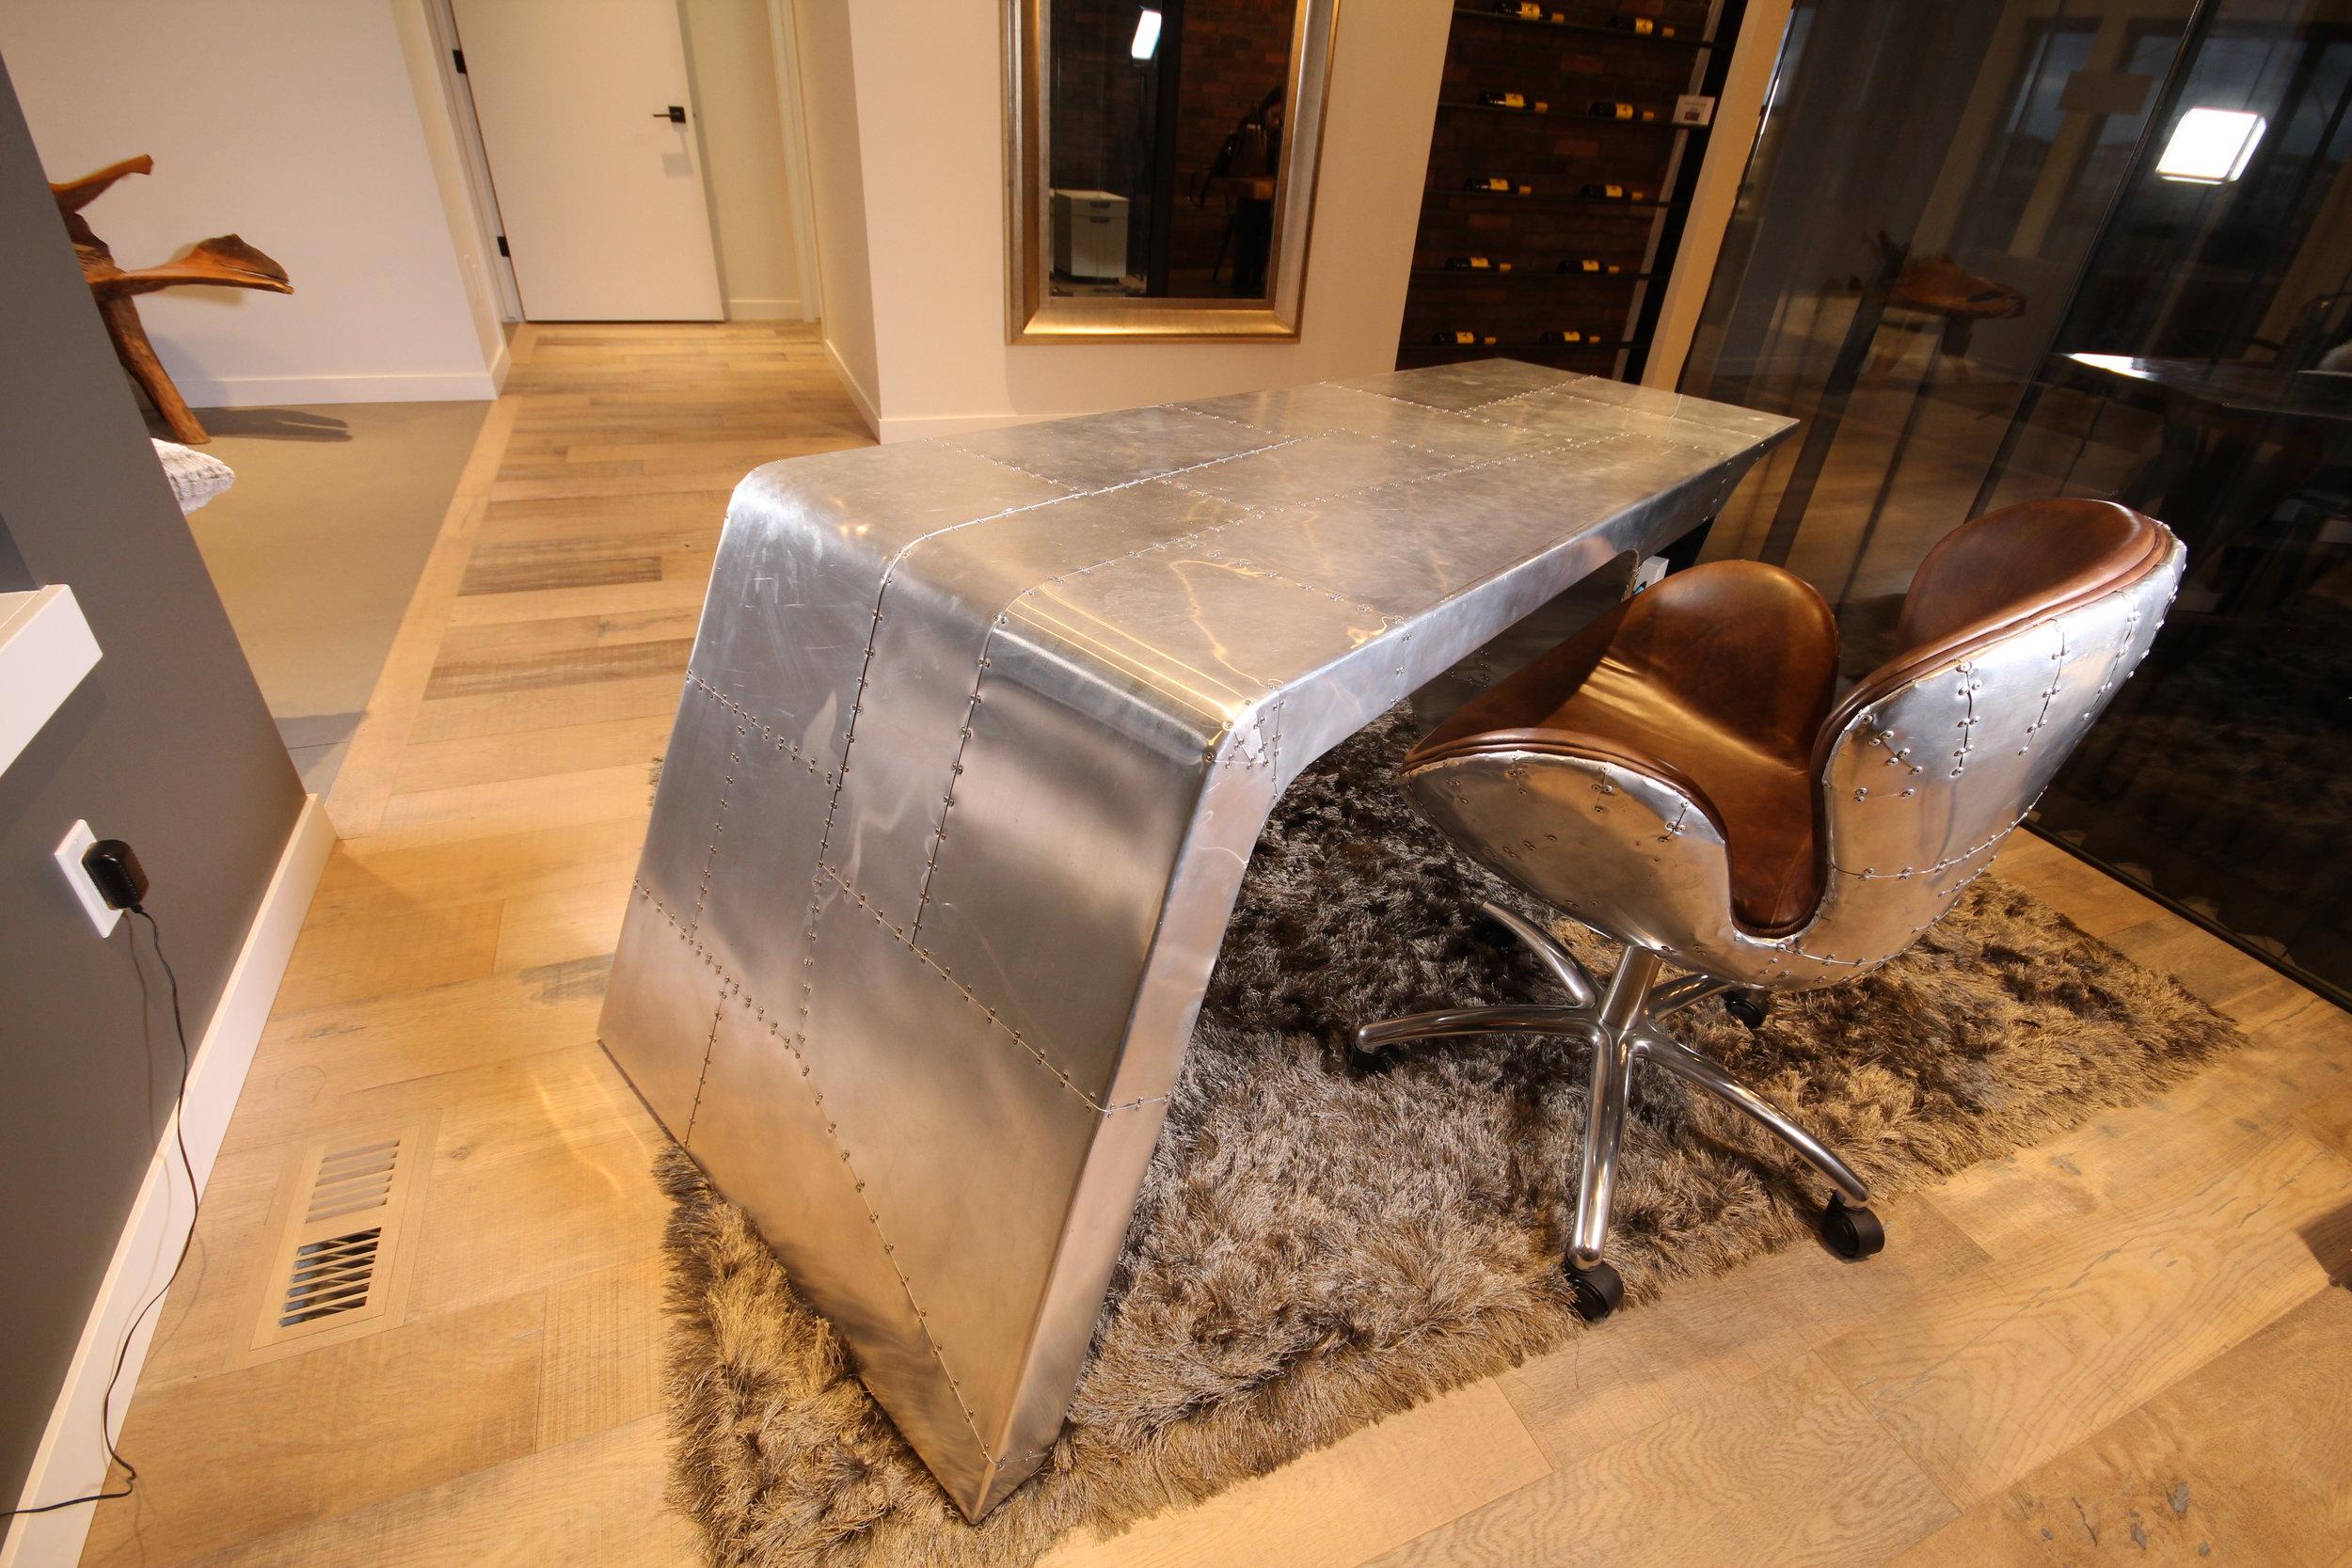 Old tobacco aviator office desk and chair, artista show home. Blue Moon Furniture. Luxury furniture winnipeg.JPG